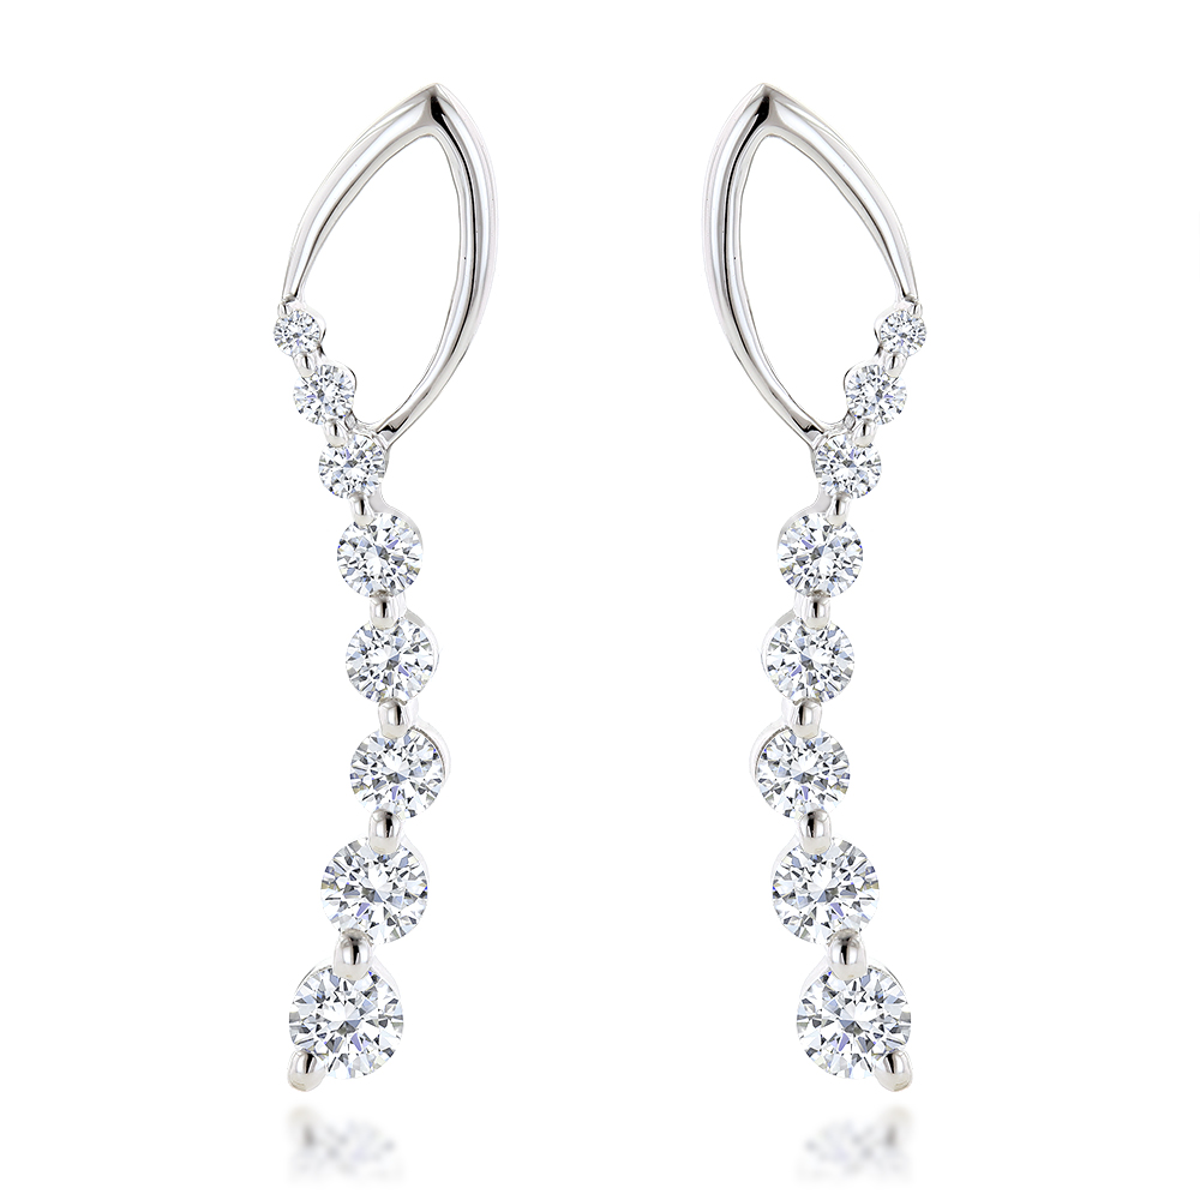 Journey Diamond Earrings For Women in 14k Gold 1.1ct